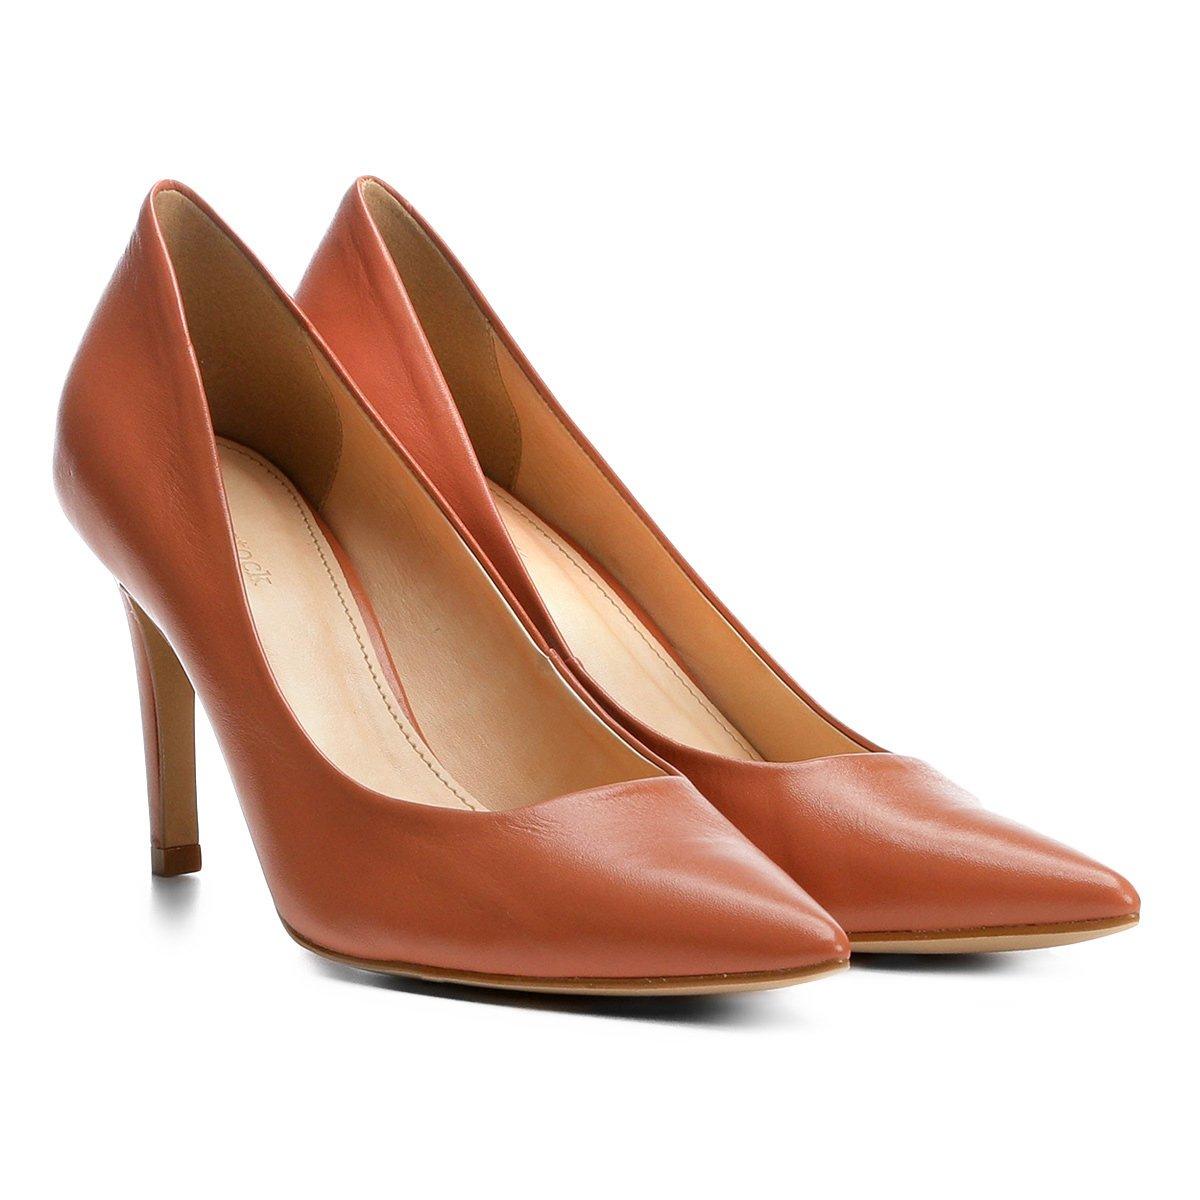 Marrom Scarpin Alto Scarpin Couro Básico Shoestock Salto Couro n0w01xfRrq